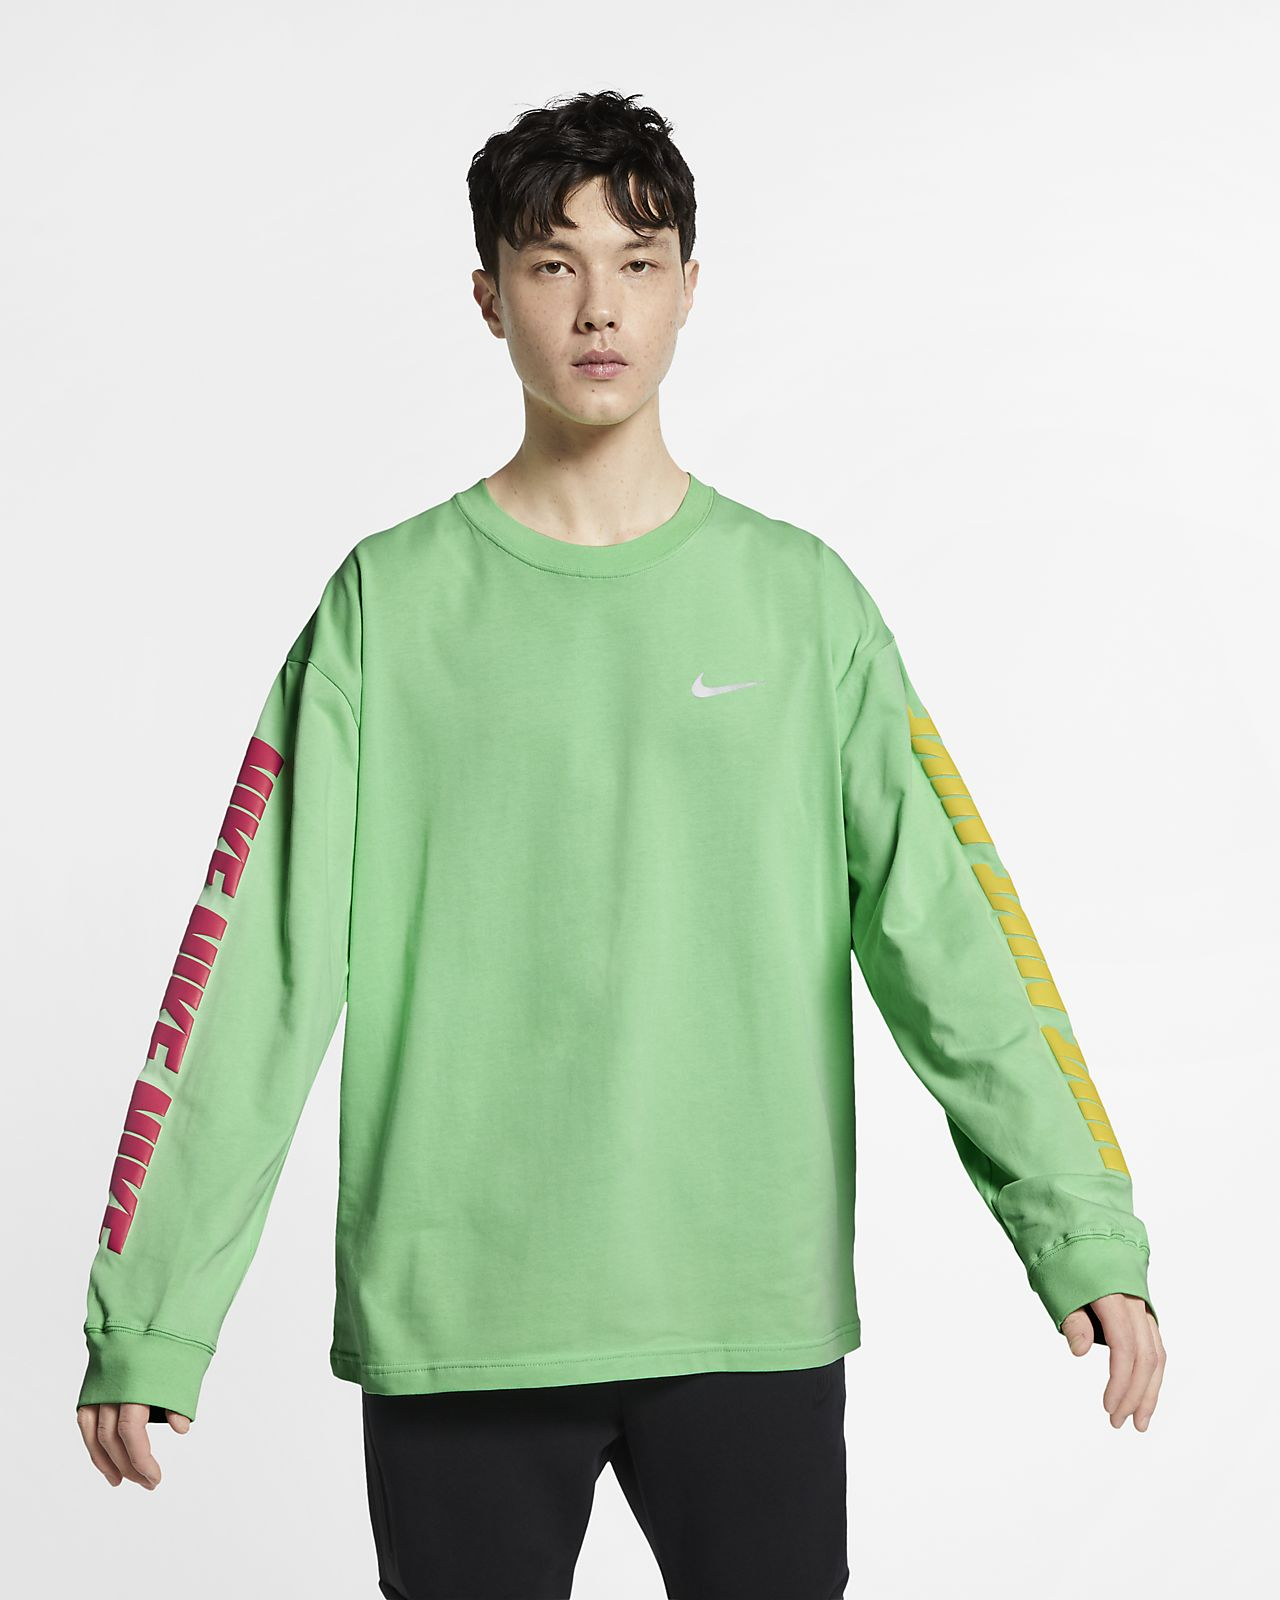 Nike langermet T-skjorte